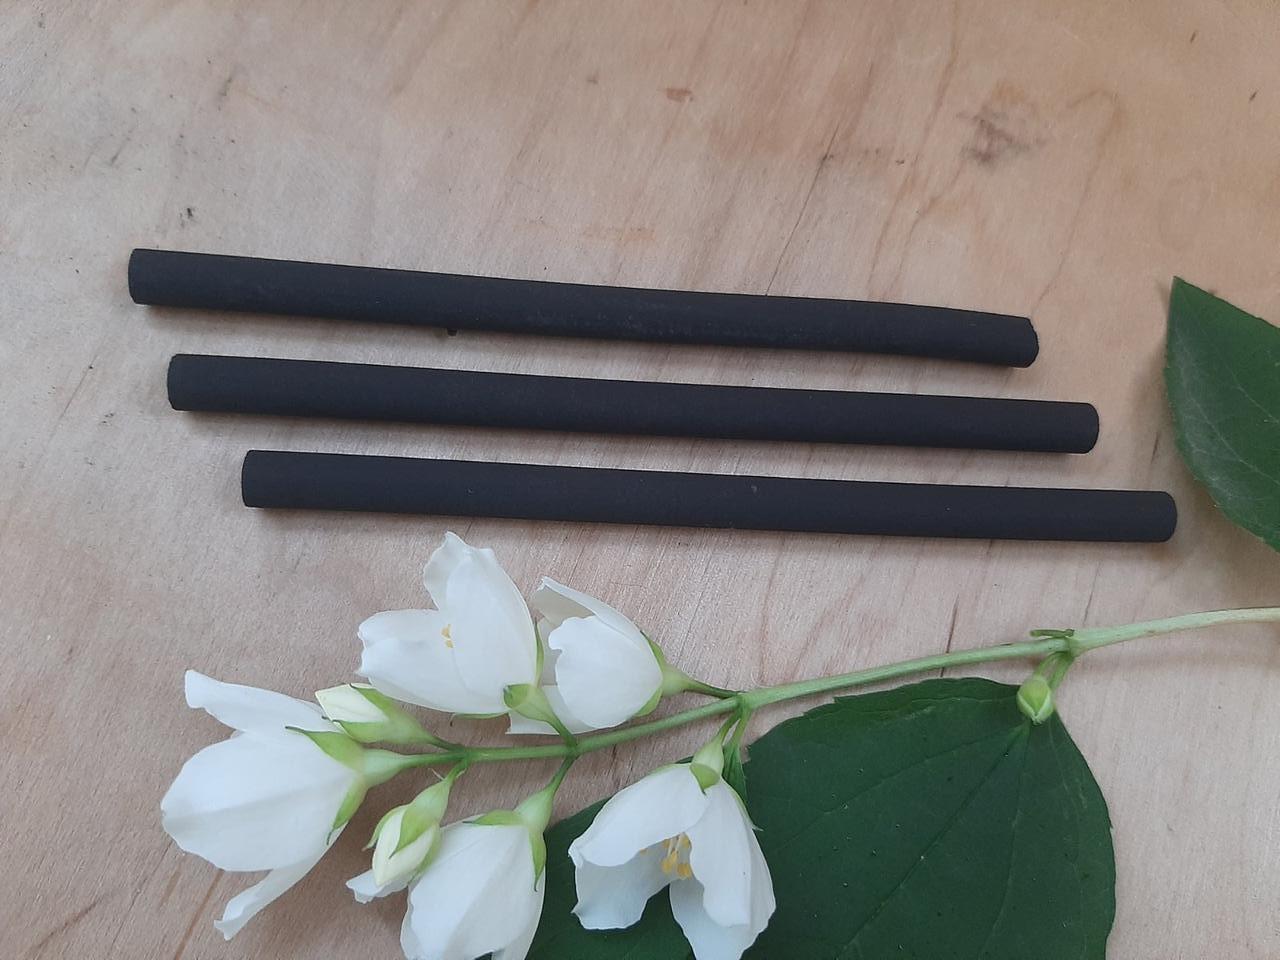 Моксы  угольные бездымные сигары  7*120 мм -30 шт